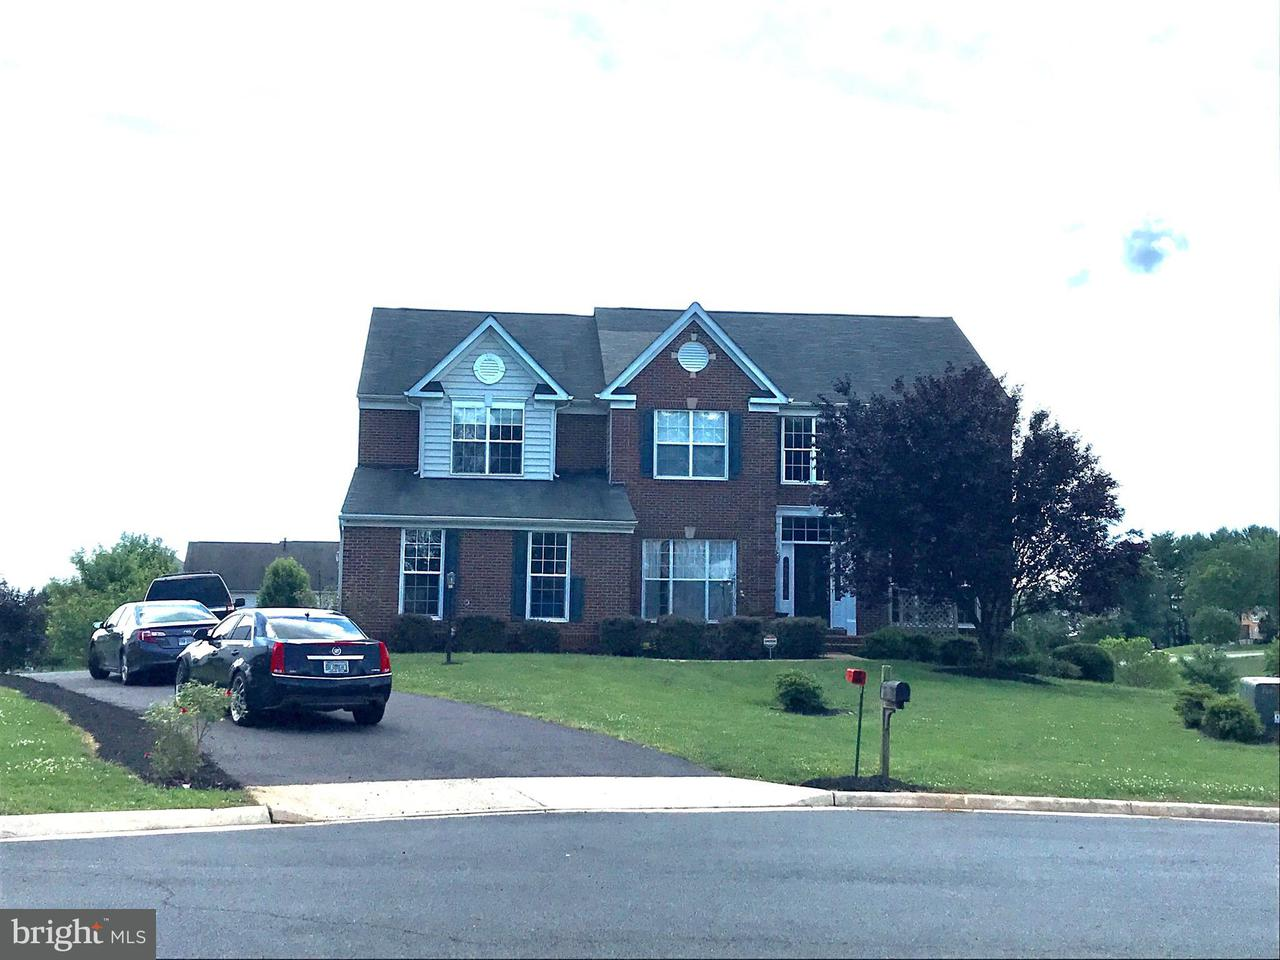 Casa Unifamiliar por un Venta en 15204 PRAIRIE Court 15204 PRAIRIE Court Culpeper, Virginia 22701 Estados Unidos